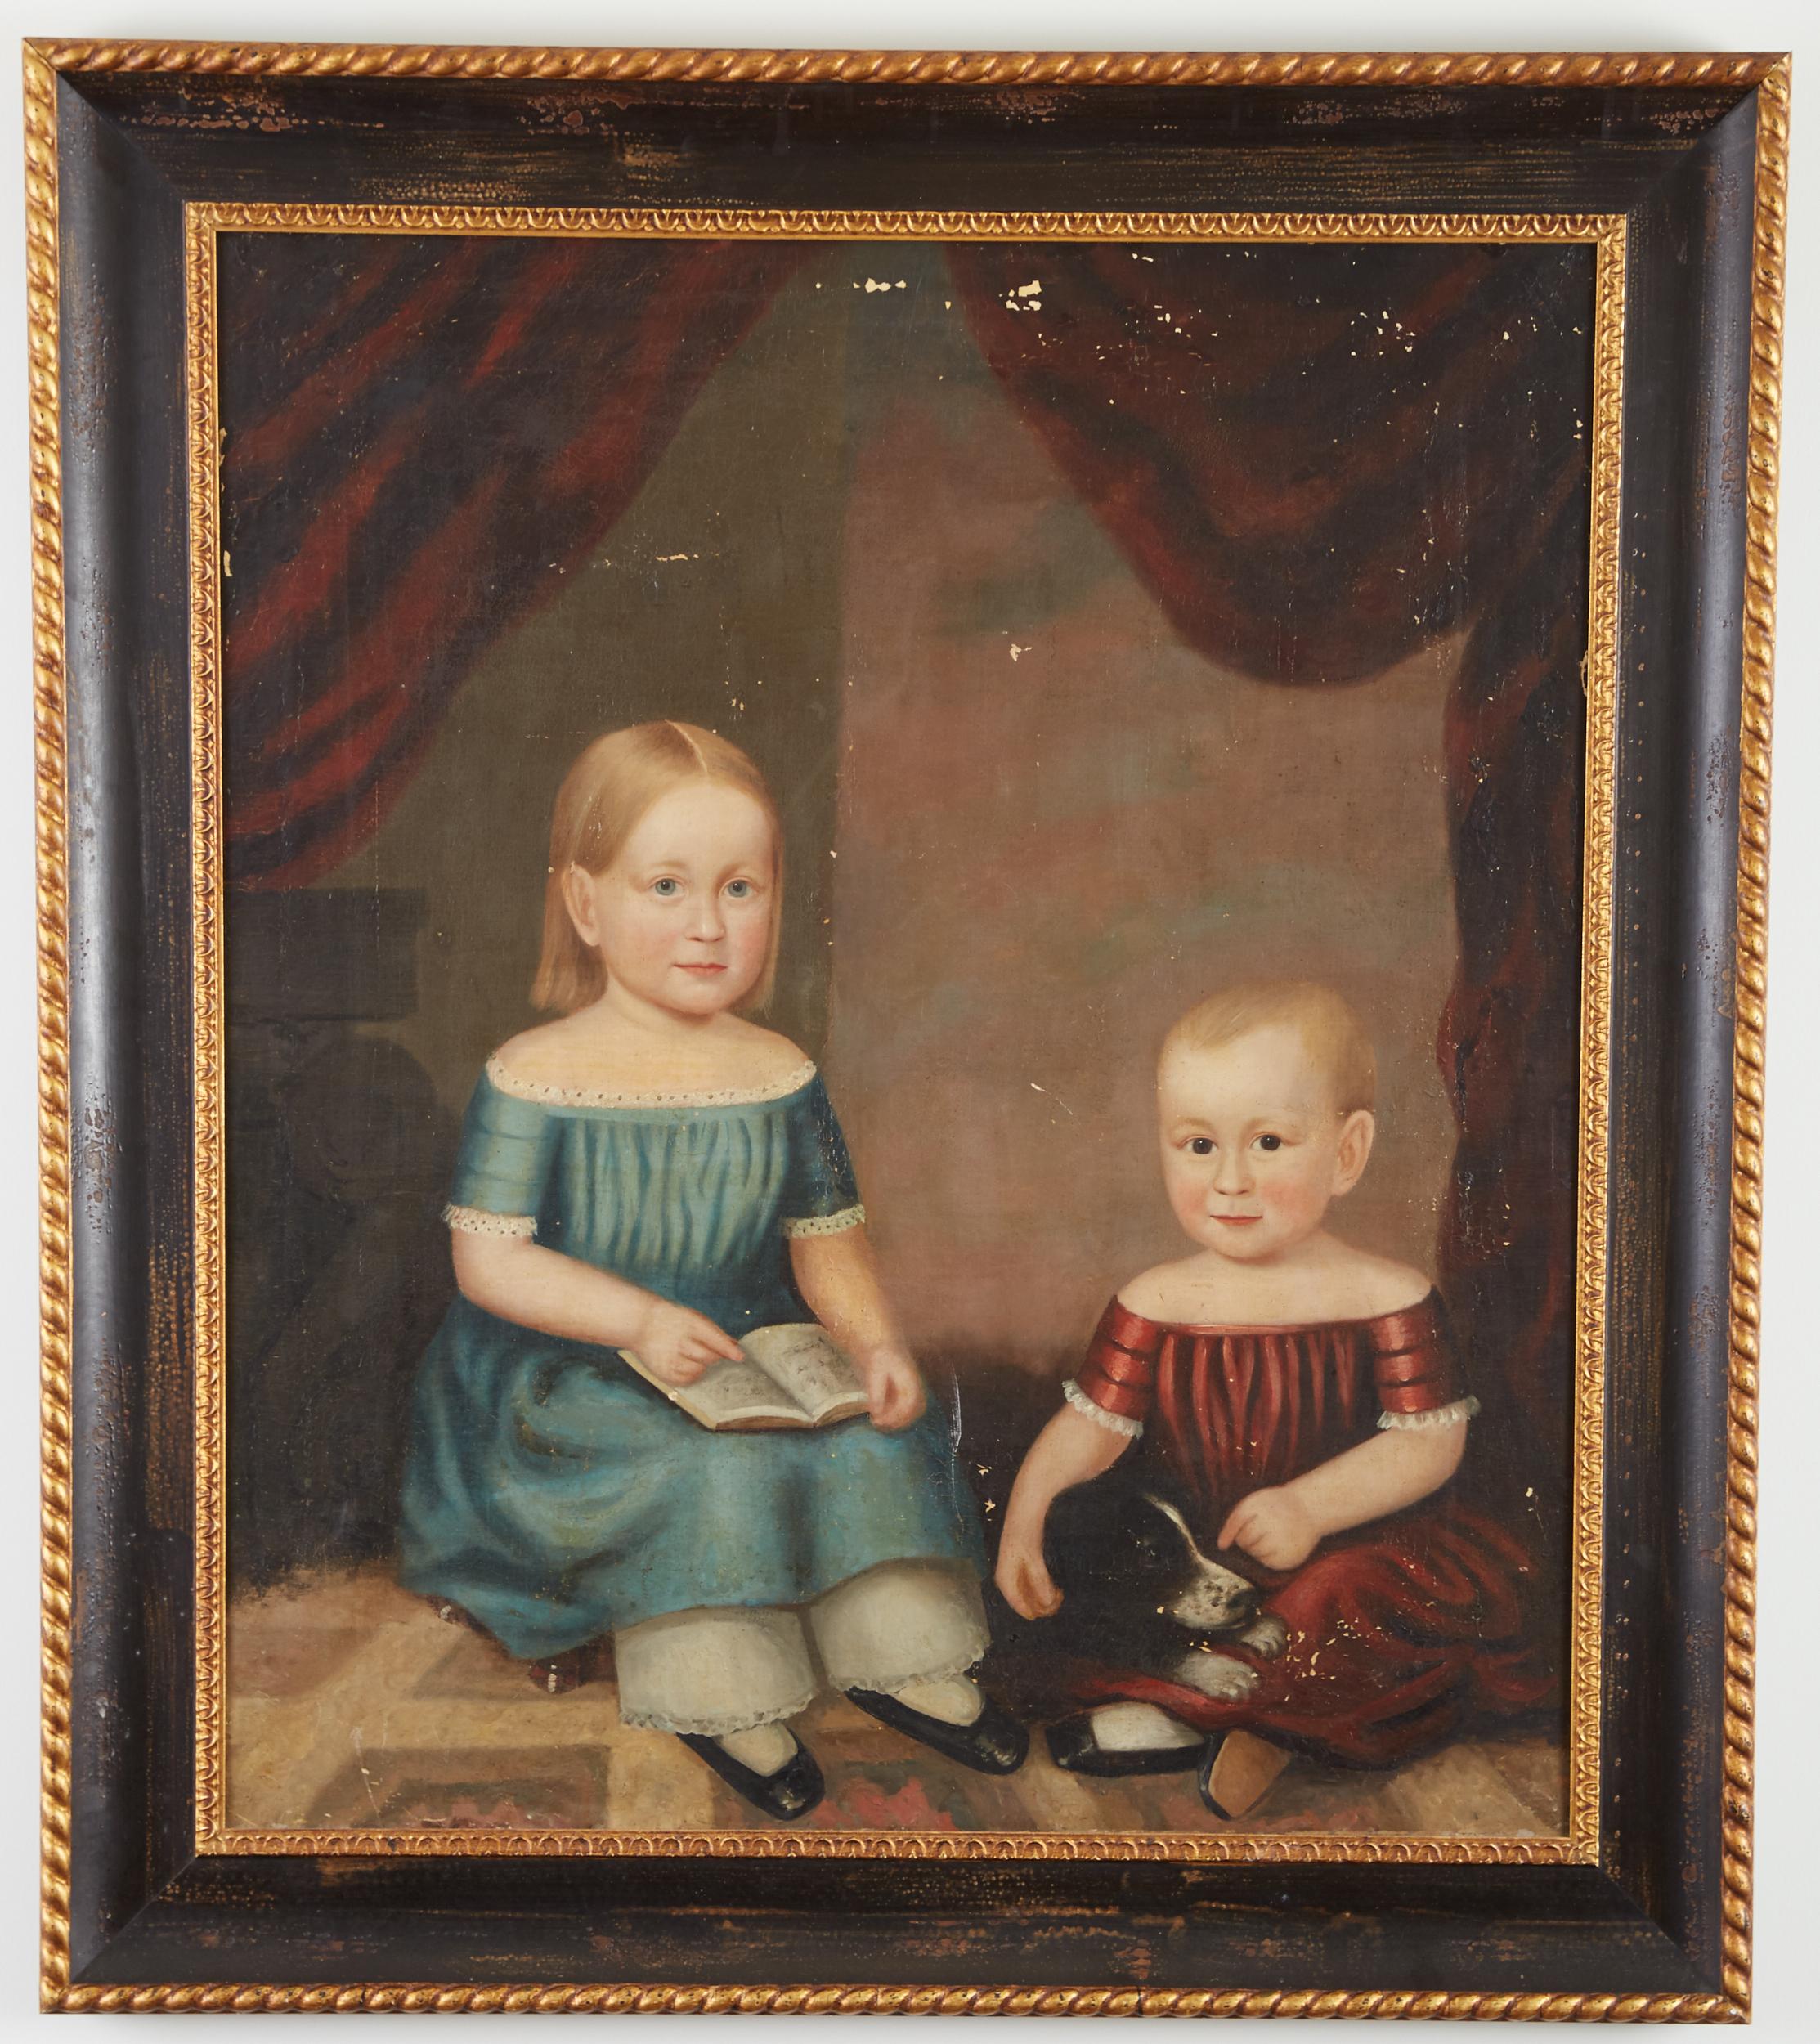 Lot 3 - 19th Century American School Folk Art Portrait Children and a Dog Unsigned